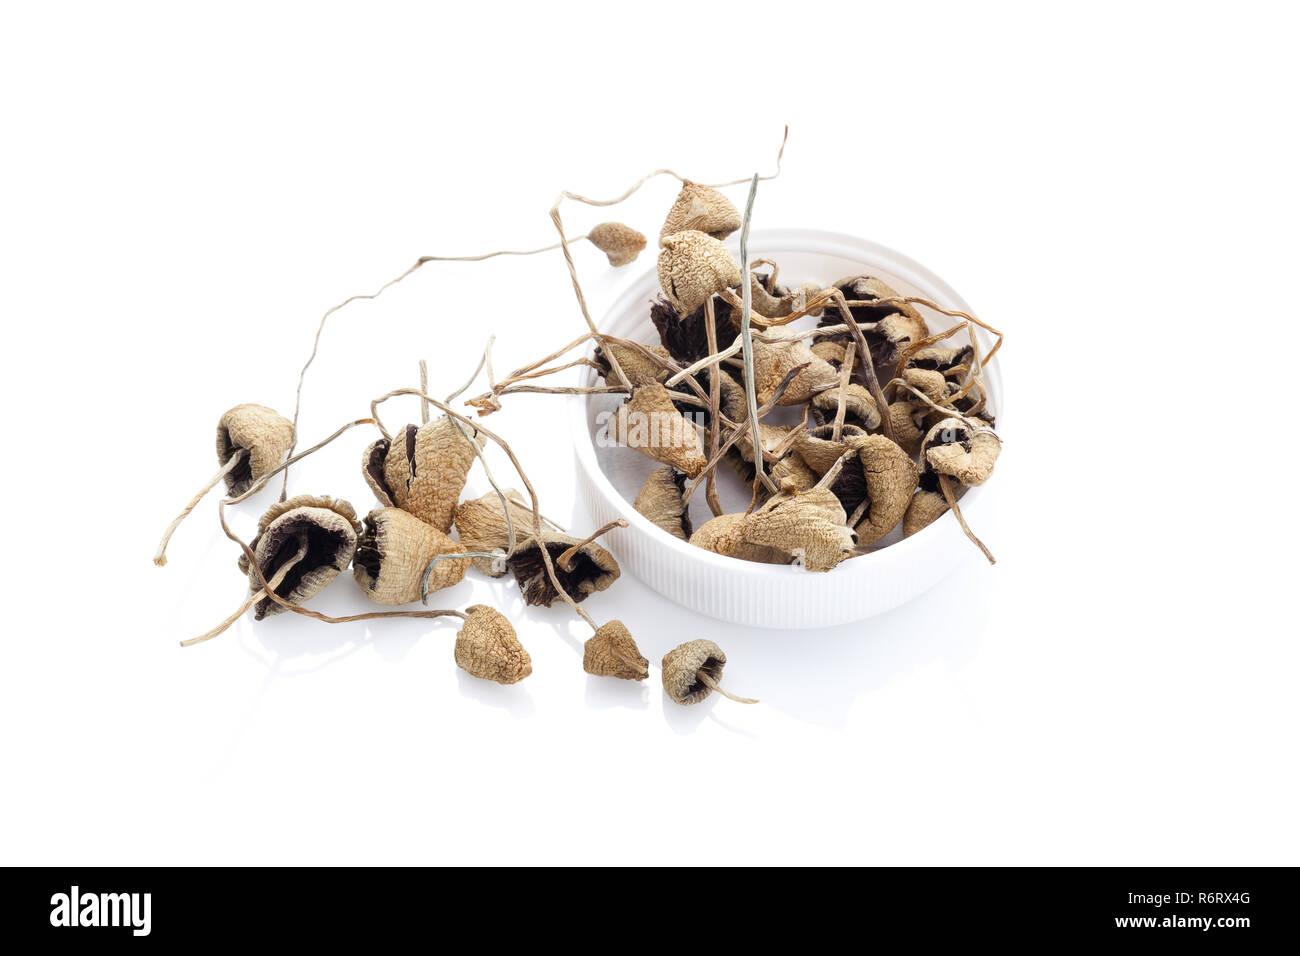 Dried Psilocybin Mushrooms Stock Photos & Dried Psilocybin